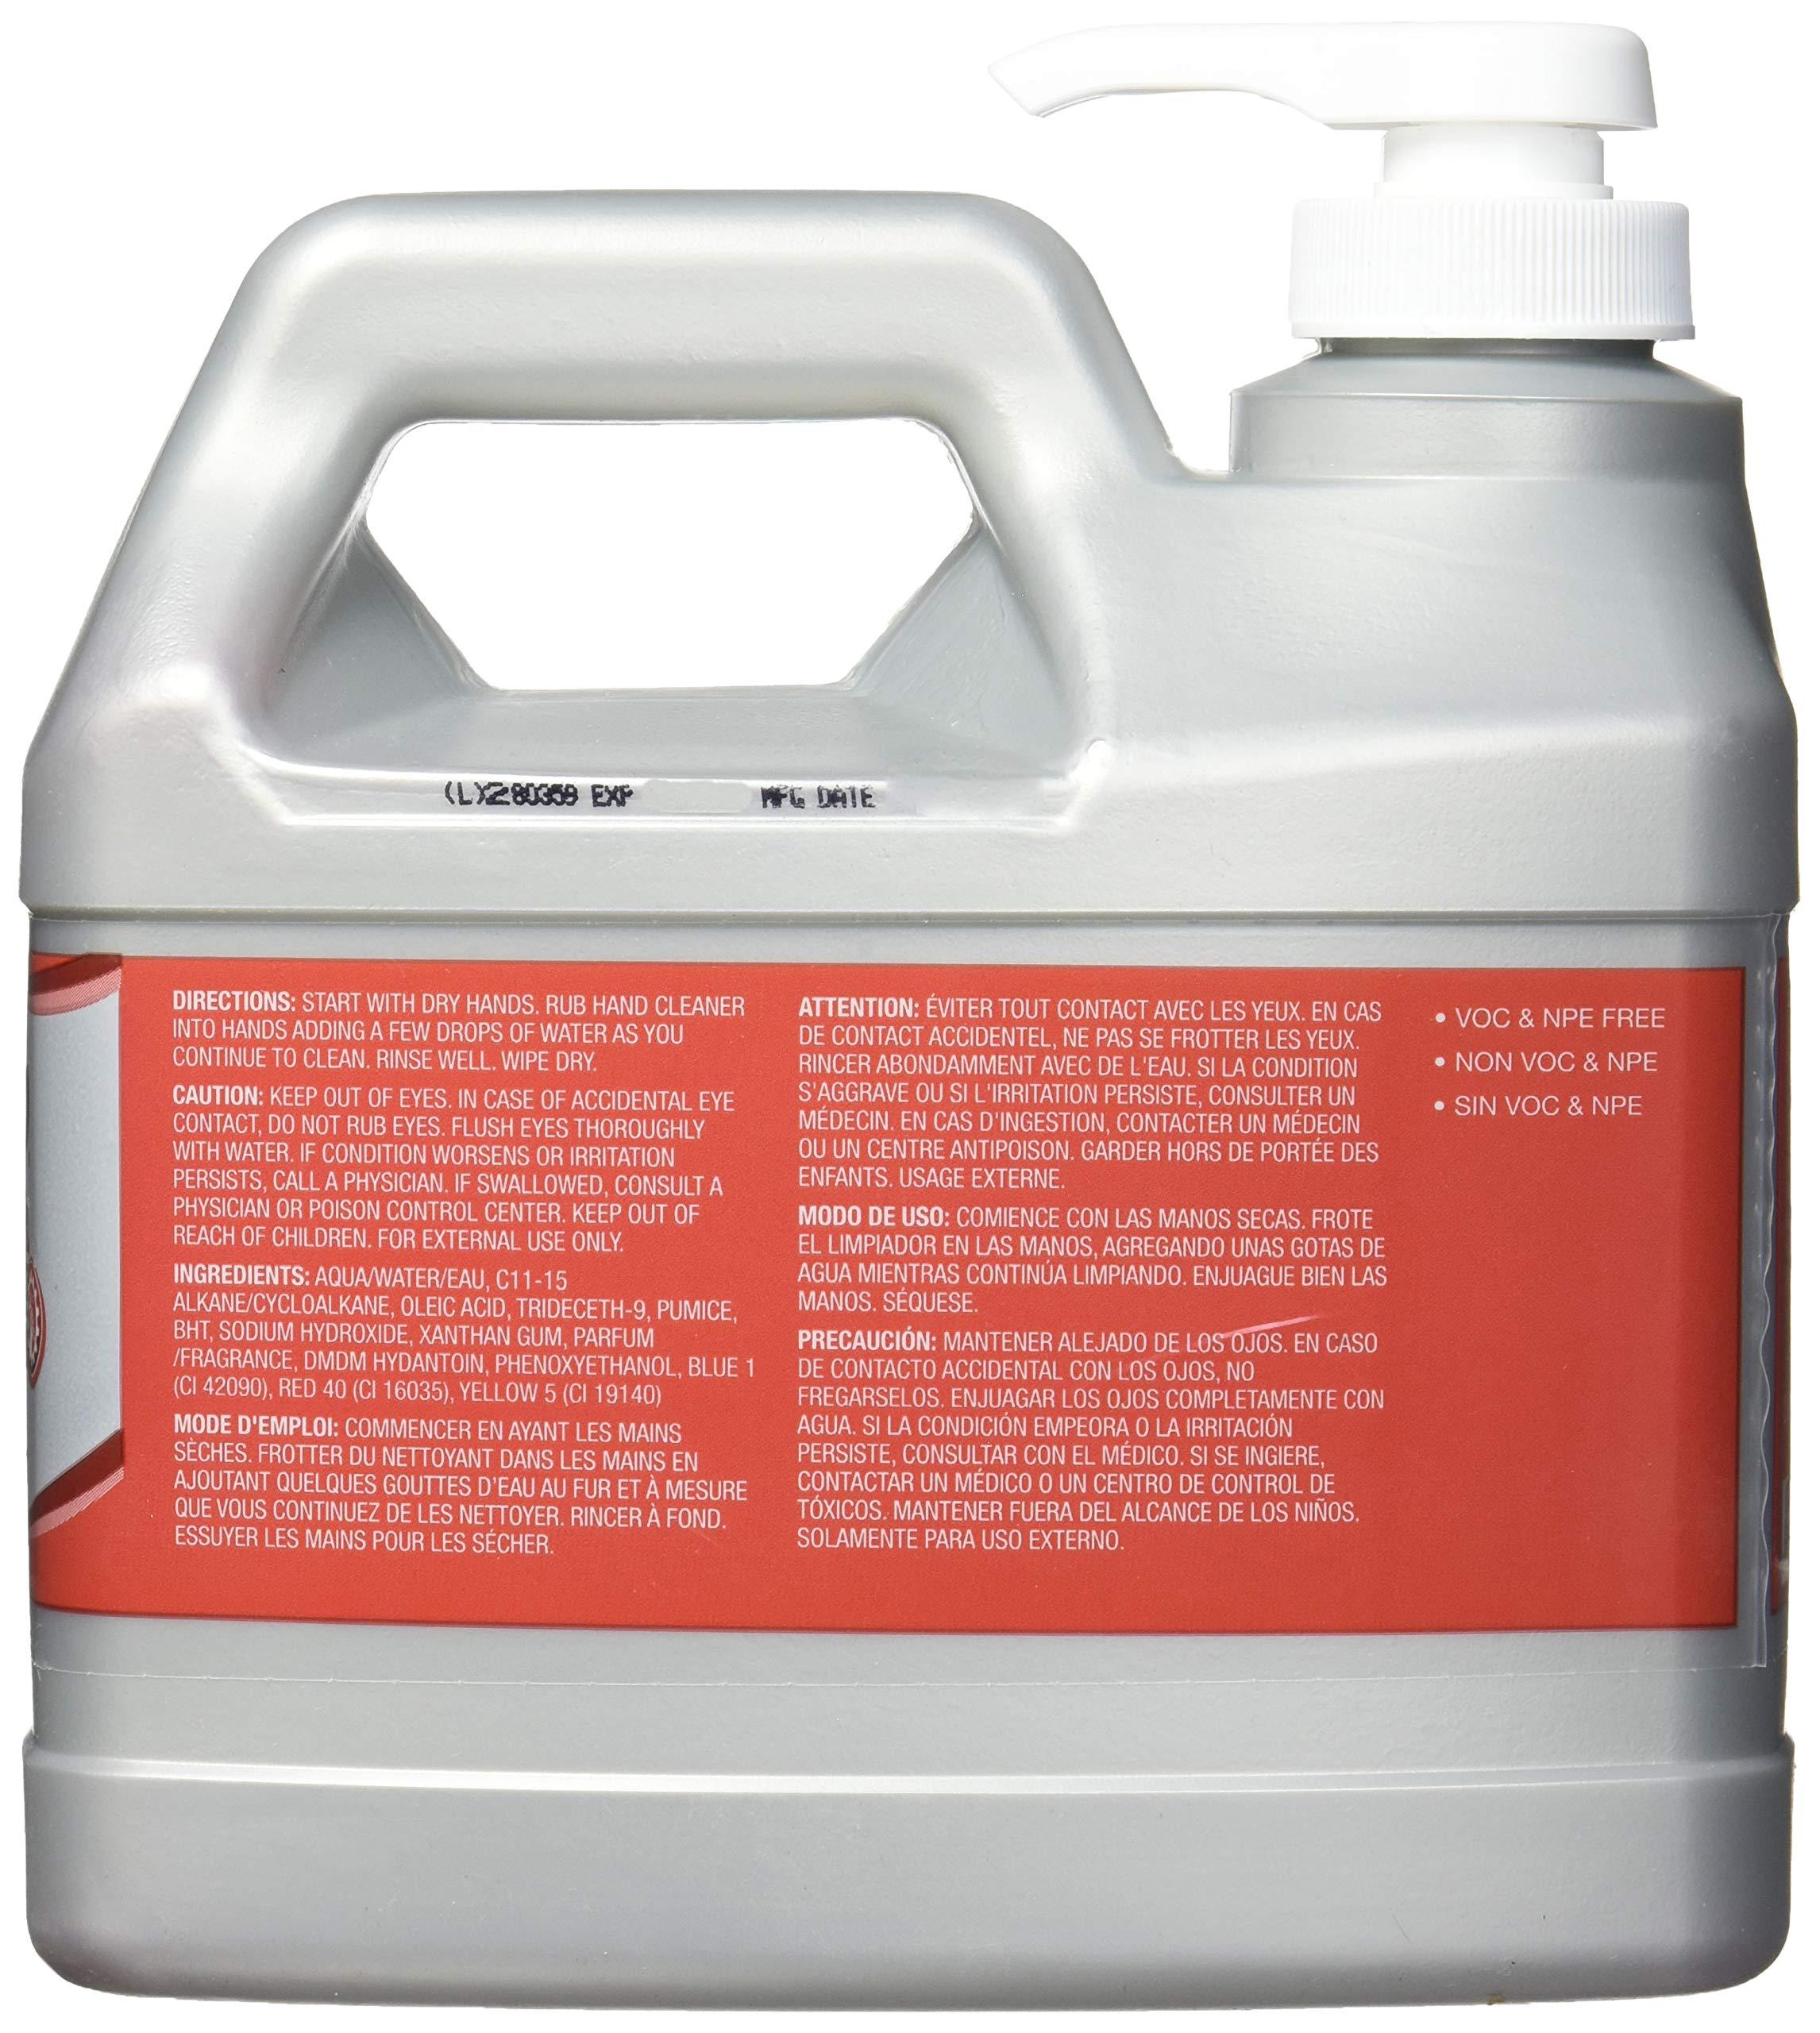 Gojo 2356-04 Cherry Gel Pumice Hand Cleaner, 0.5-gallon by Gojo (Image #1)